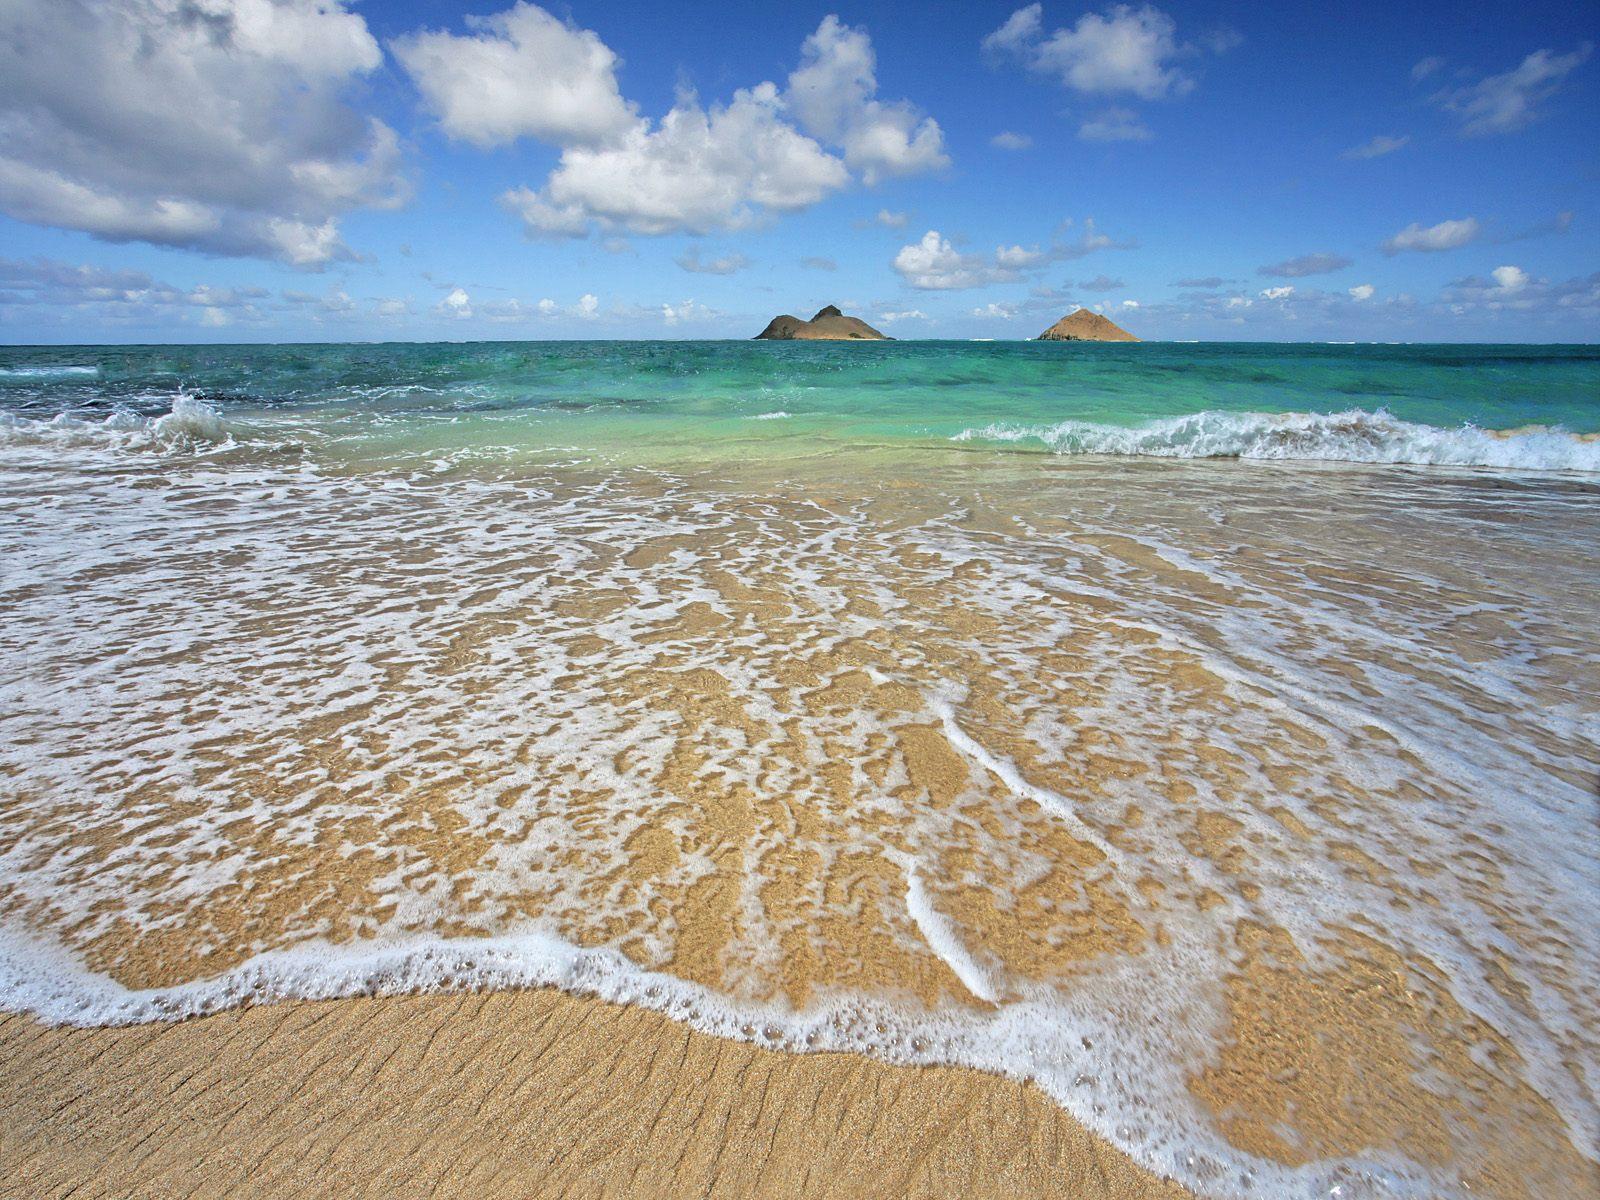 http://1.bp.blogspot.com/-cyw0uWH6cKU/TepEw6oYvYI/AAAAAAAAAqo/w31a_Yxjv20/s1600/Lanikai_Shoreline_Oahu_Hawaii%2528www.TheWallpapers.org%2529.jpg